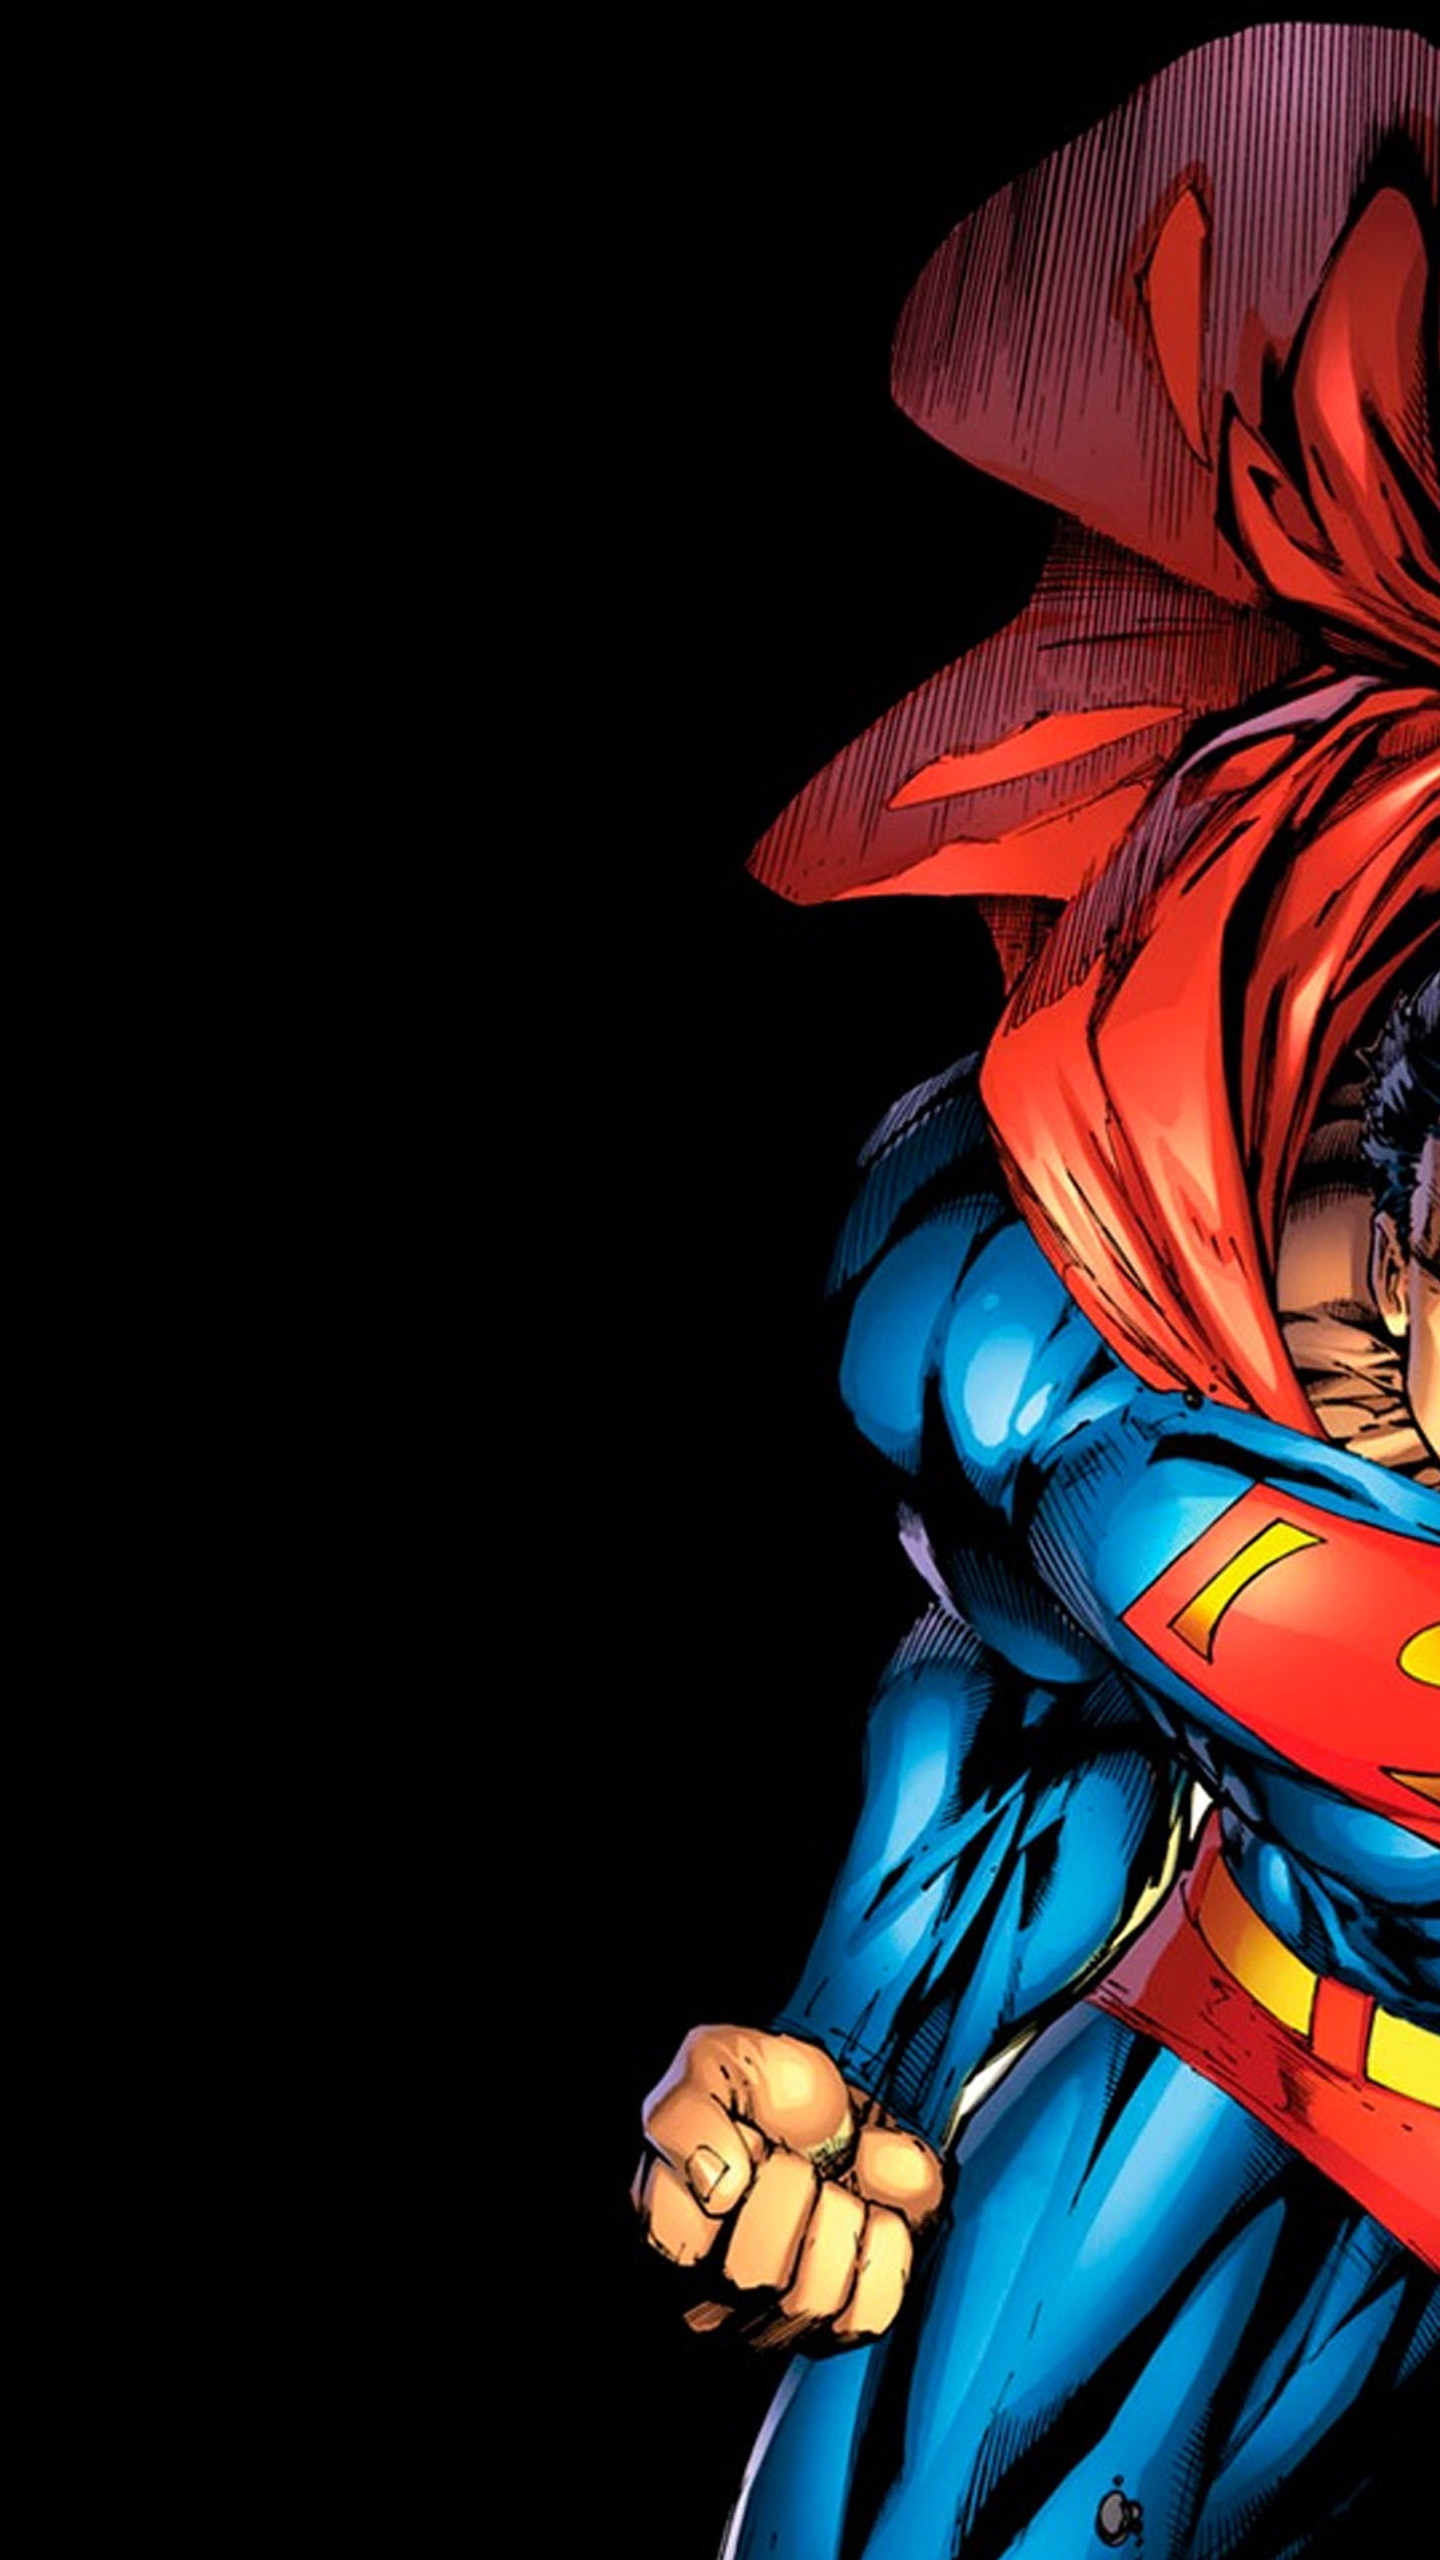 Superman V Batman Film 4K Wallpaper   superman v batman film 4k wallpaper  1080p, superman